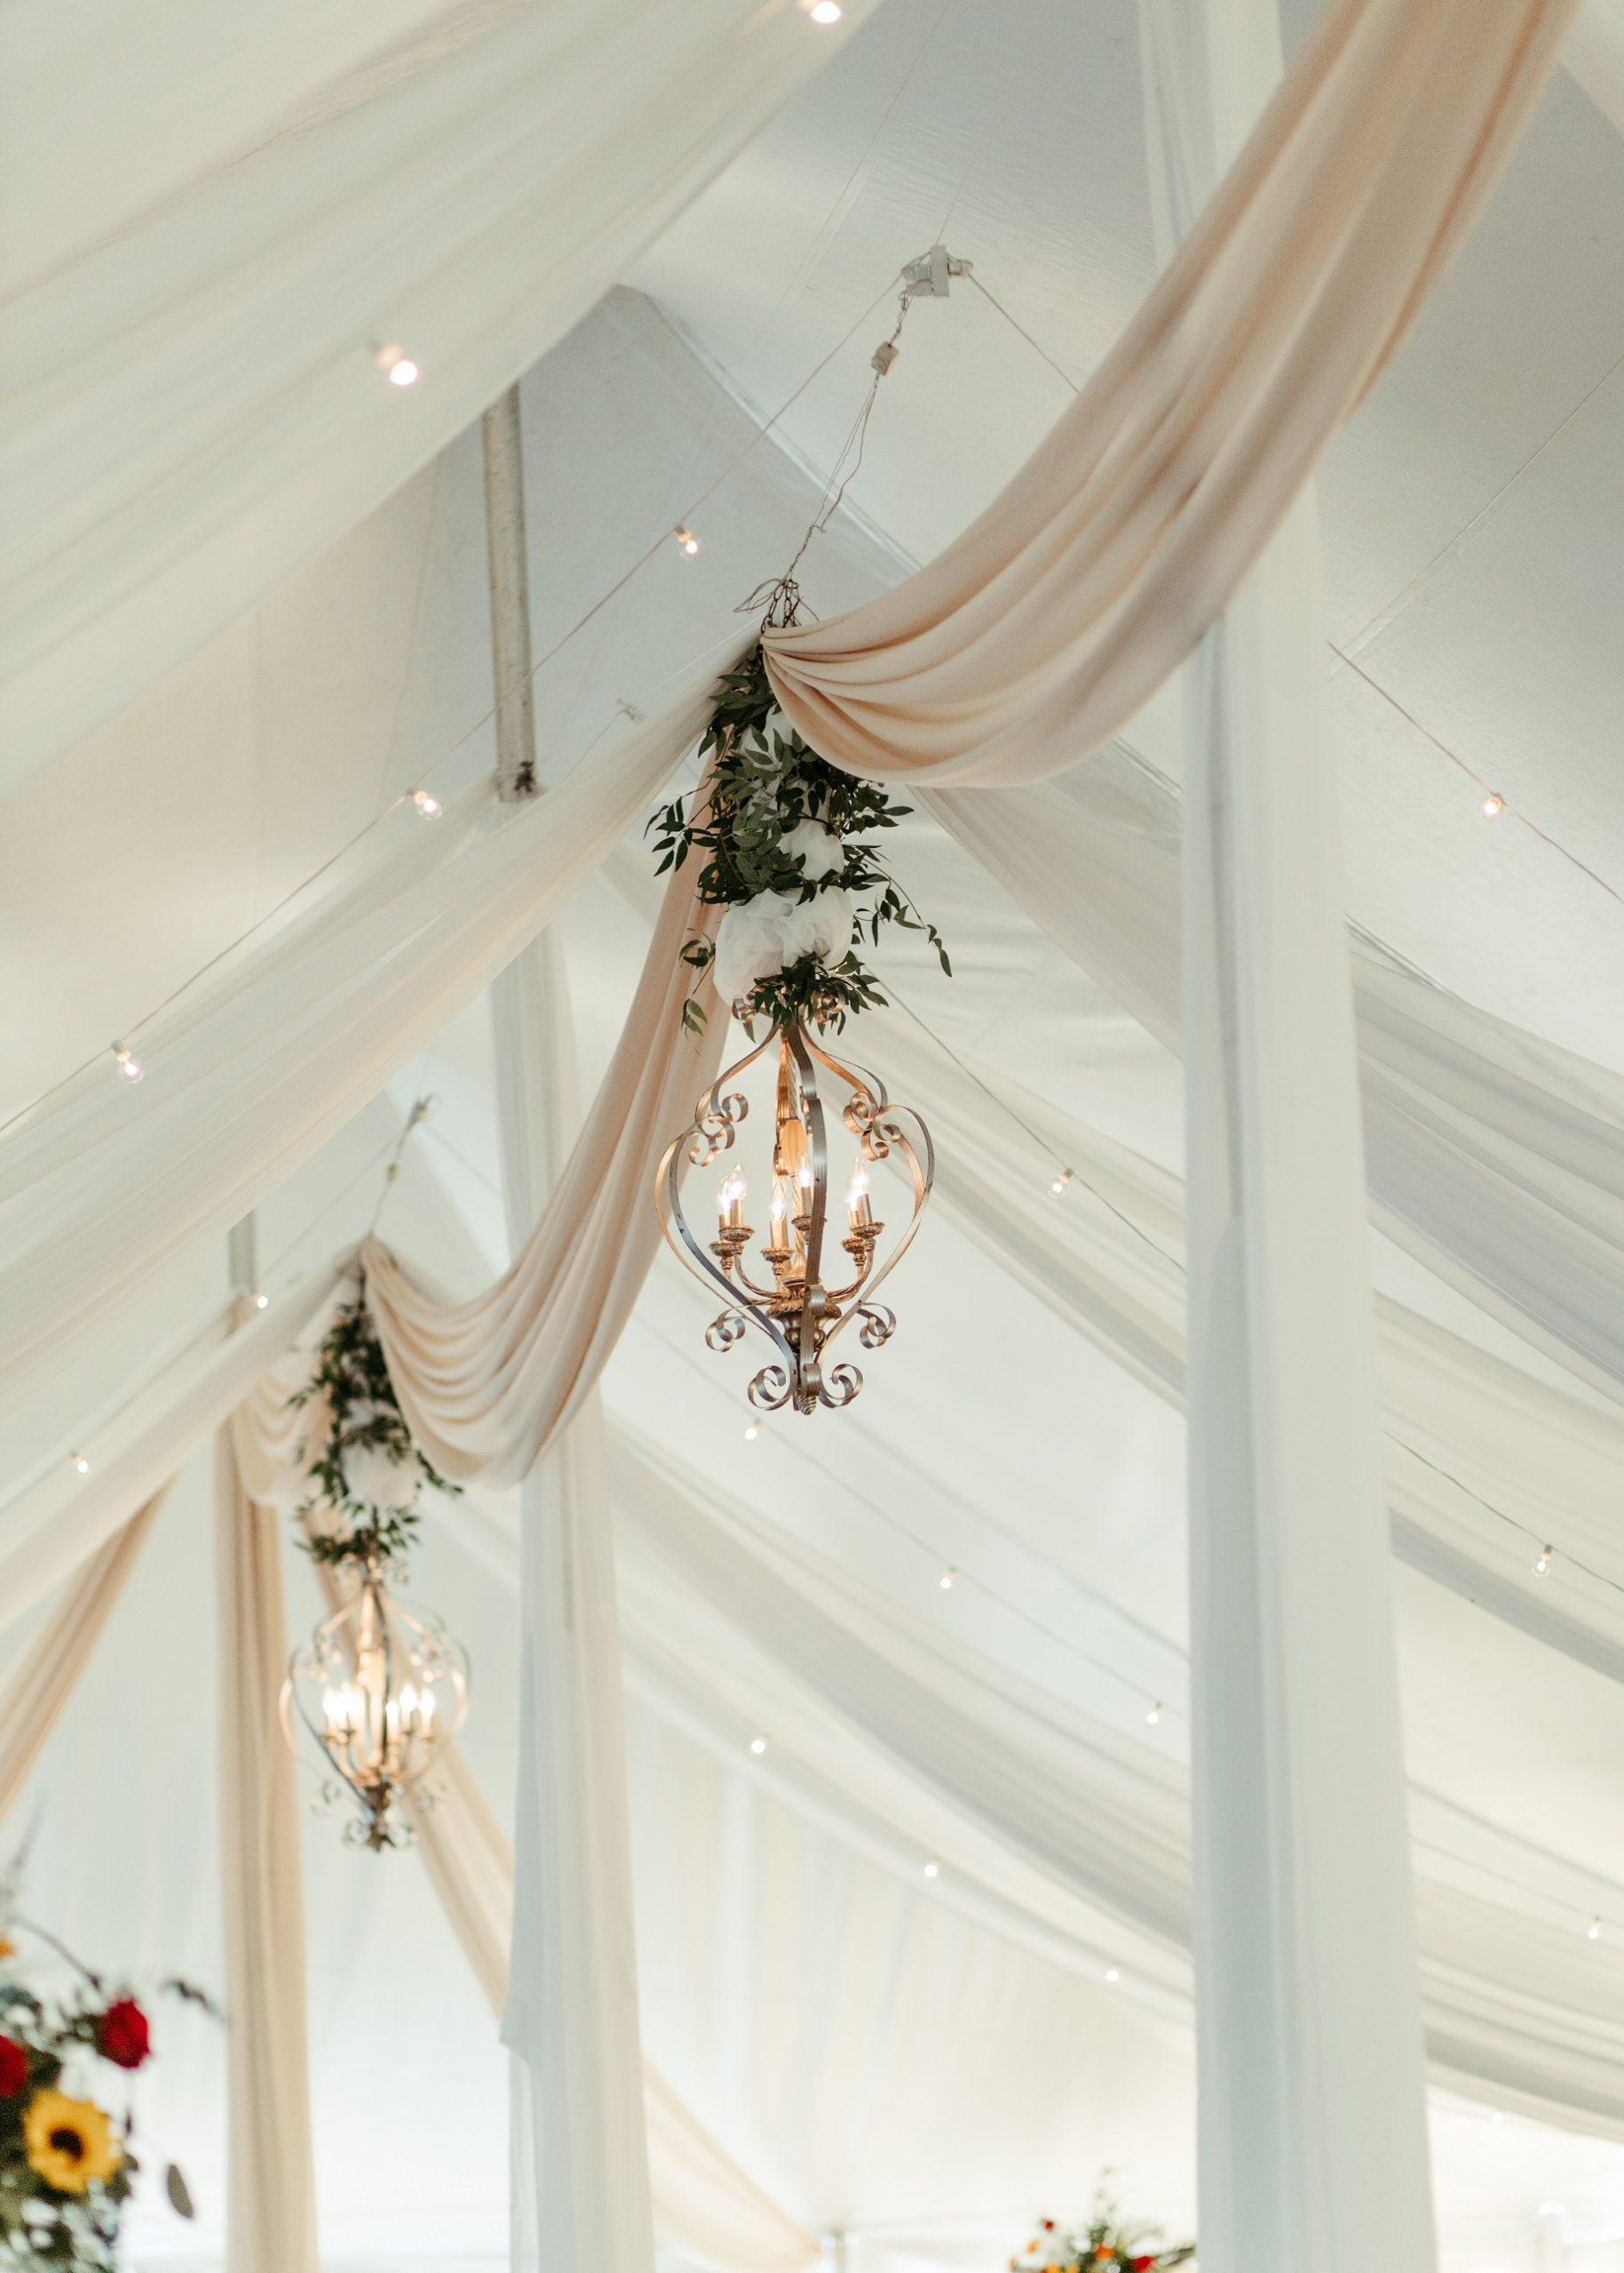 Wedding Ceiling decor devine wedding design